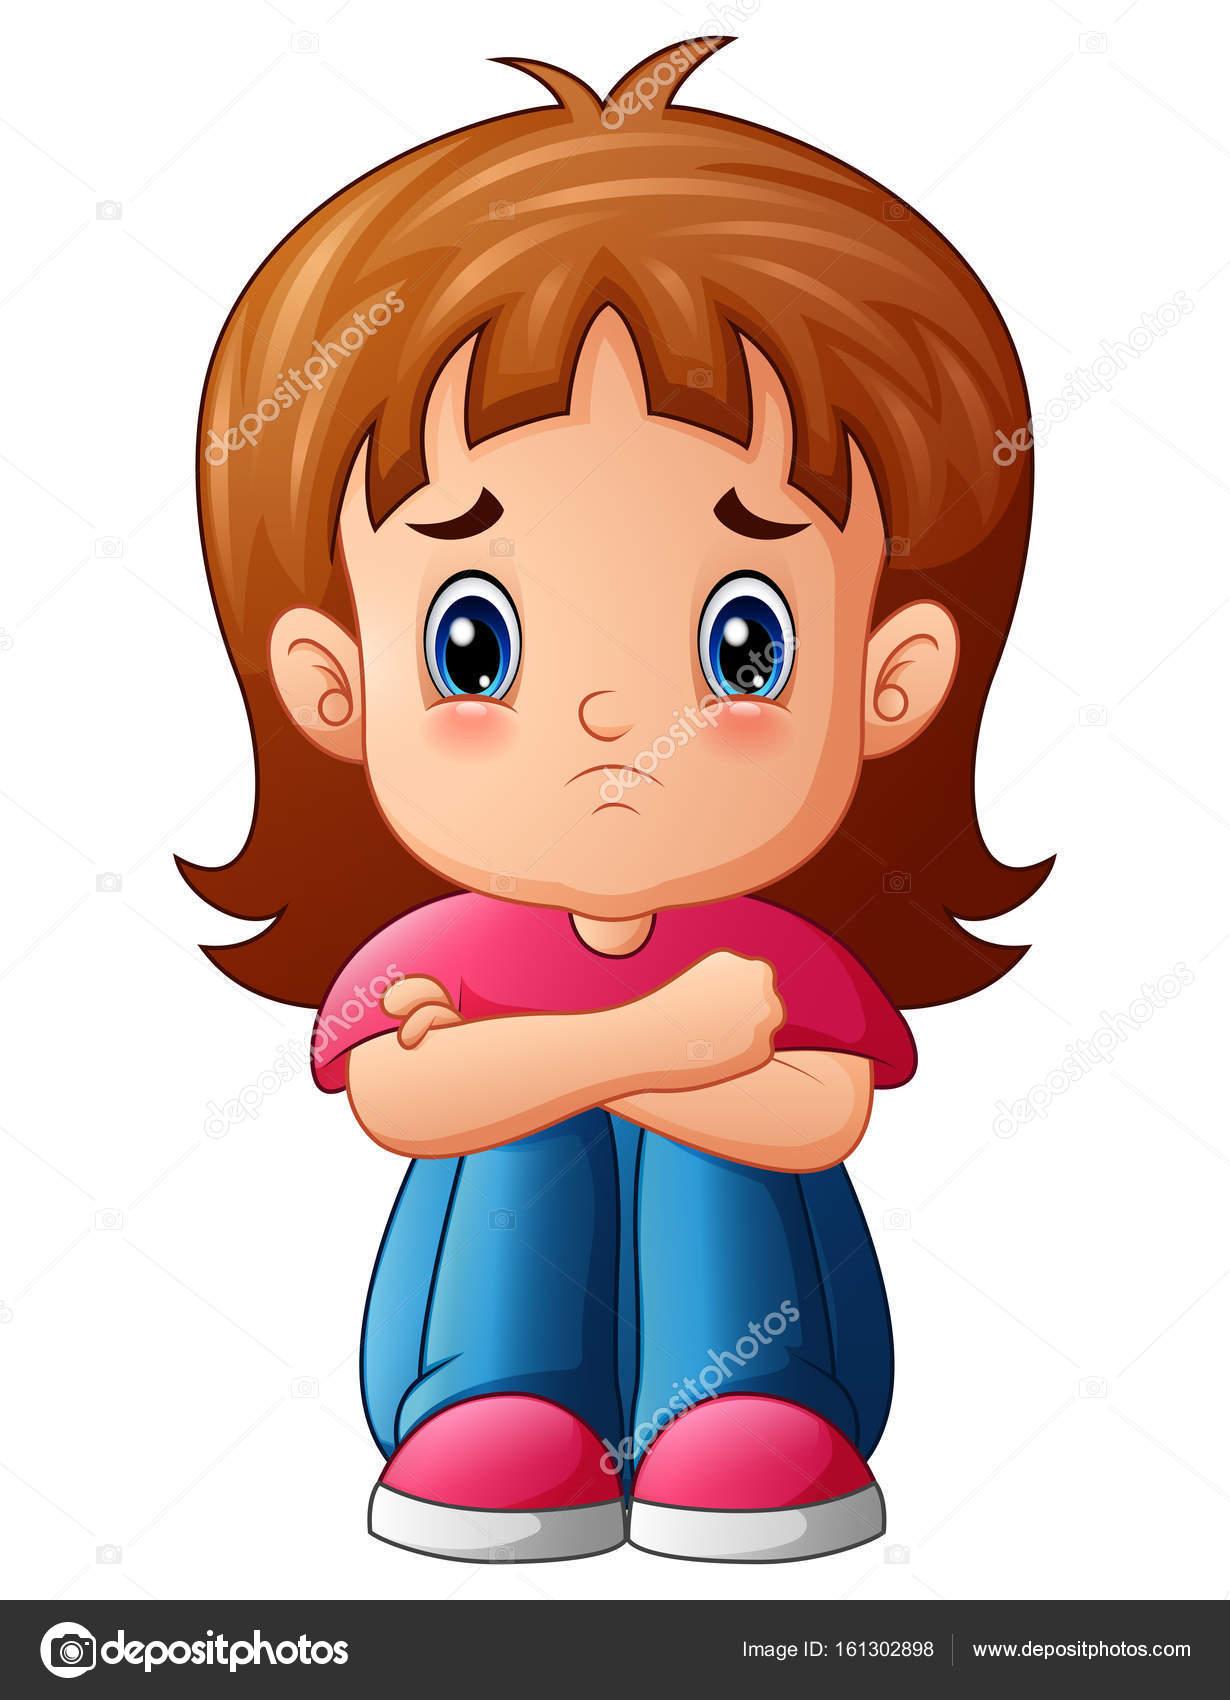 Chica triste dibujo dibujos animados chica triste - Cartoon girl sitting alone ...